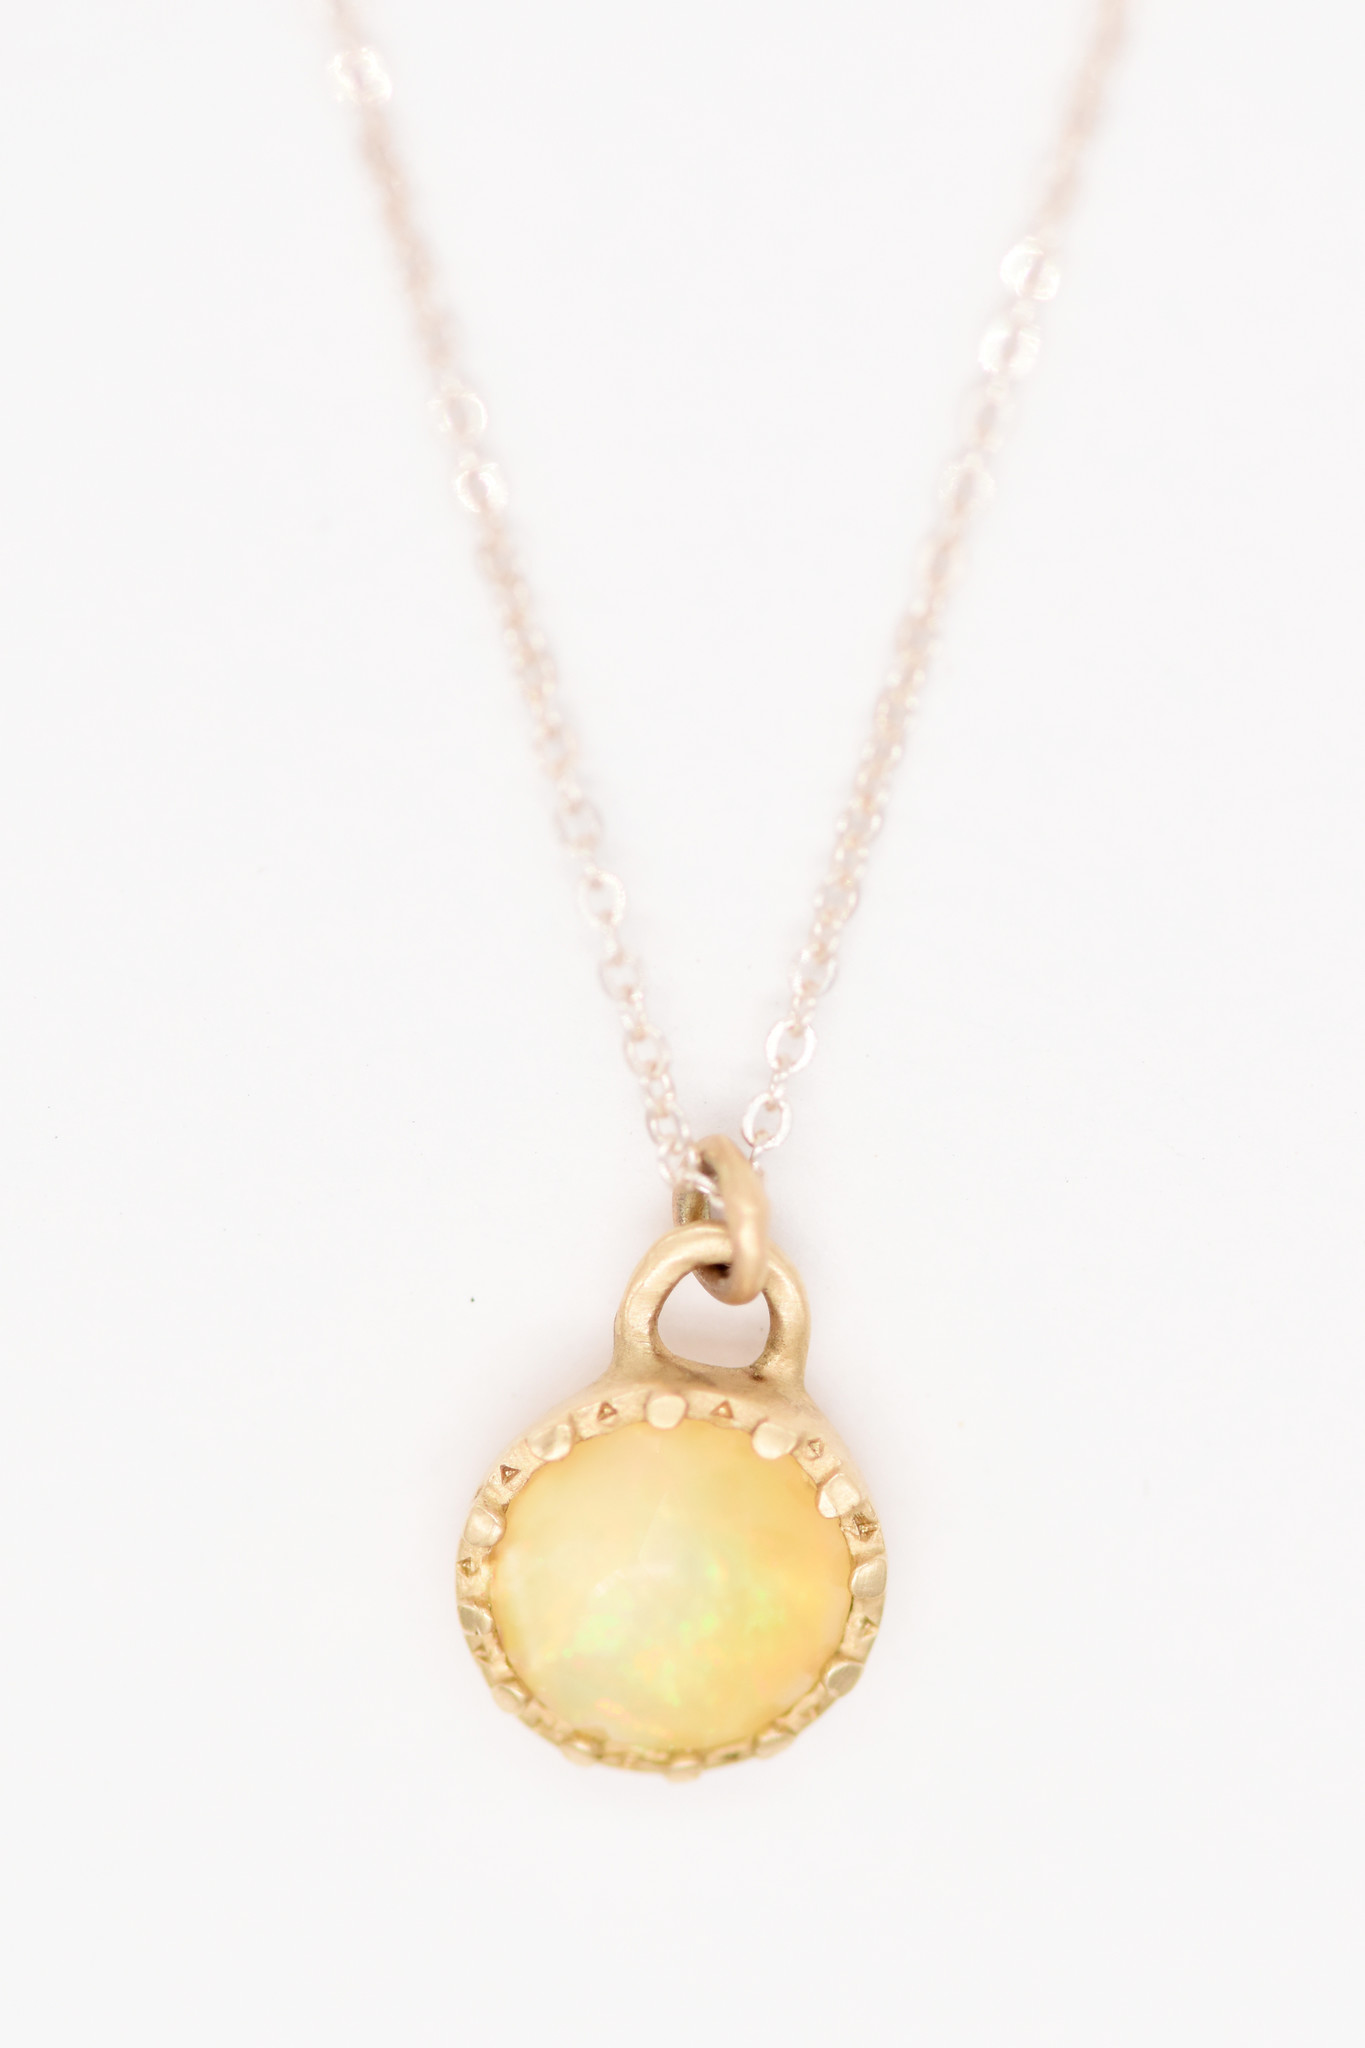 Lorak Opal Beaded Cup Necklace